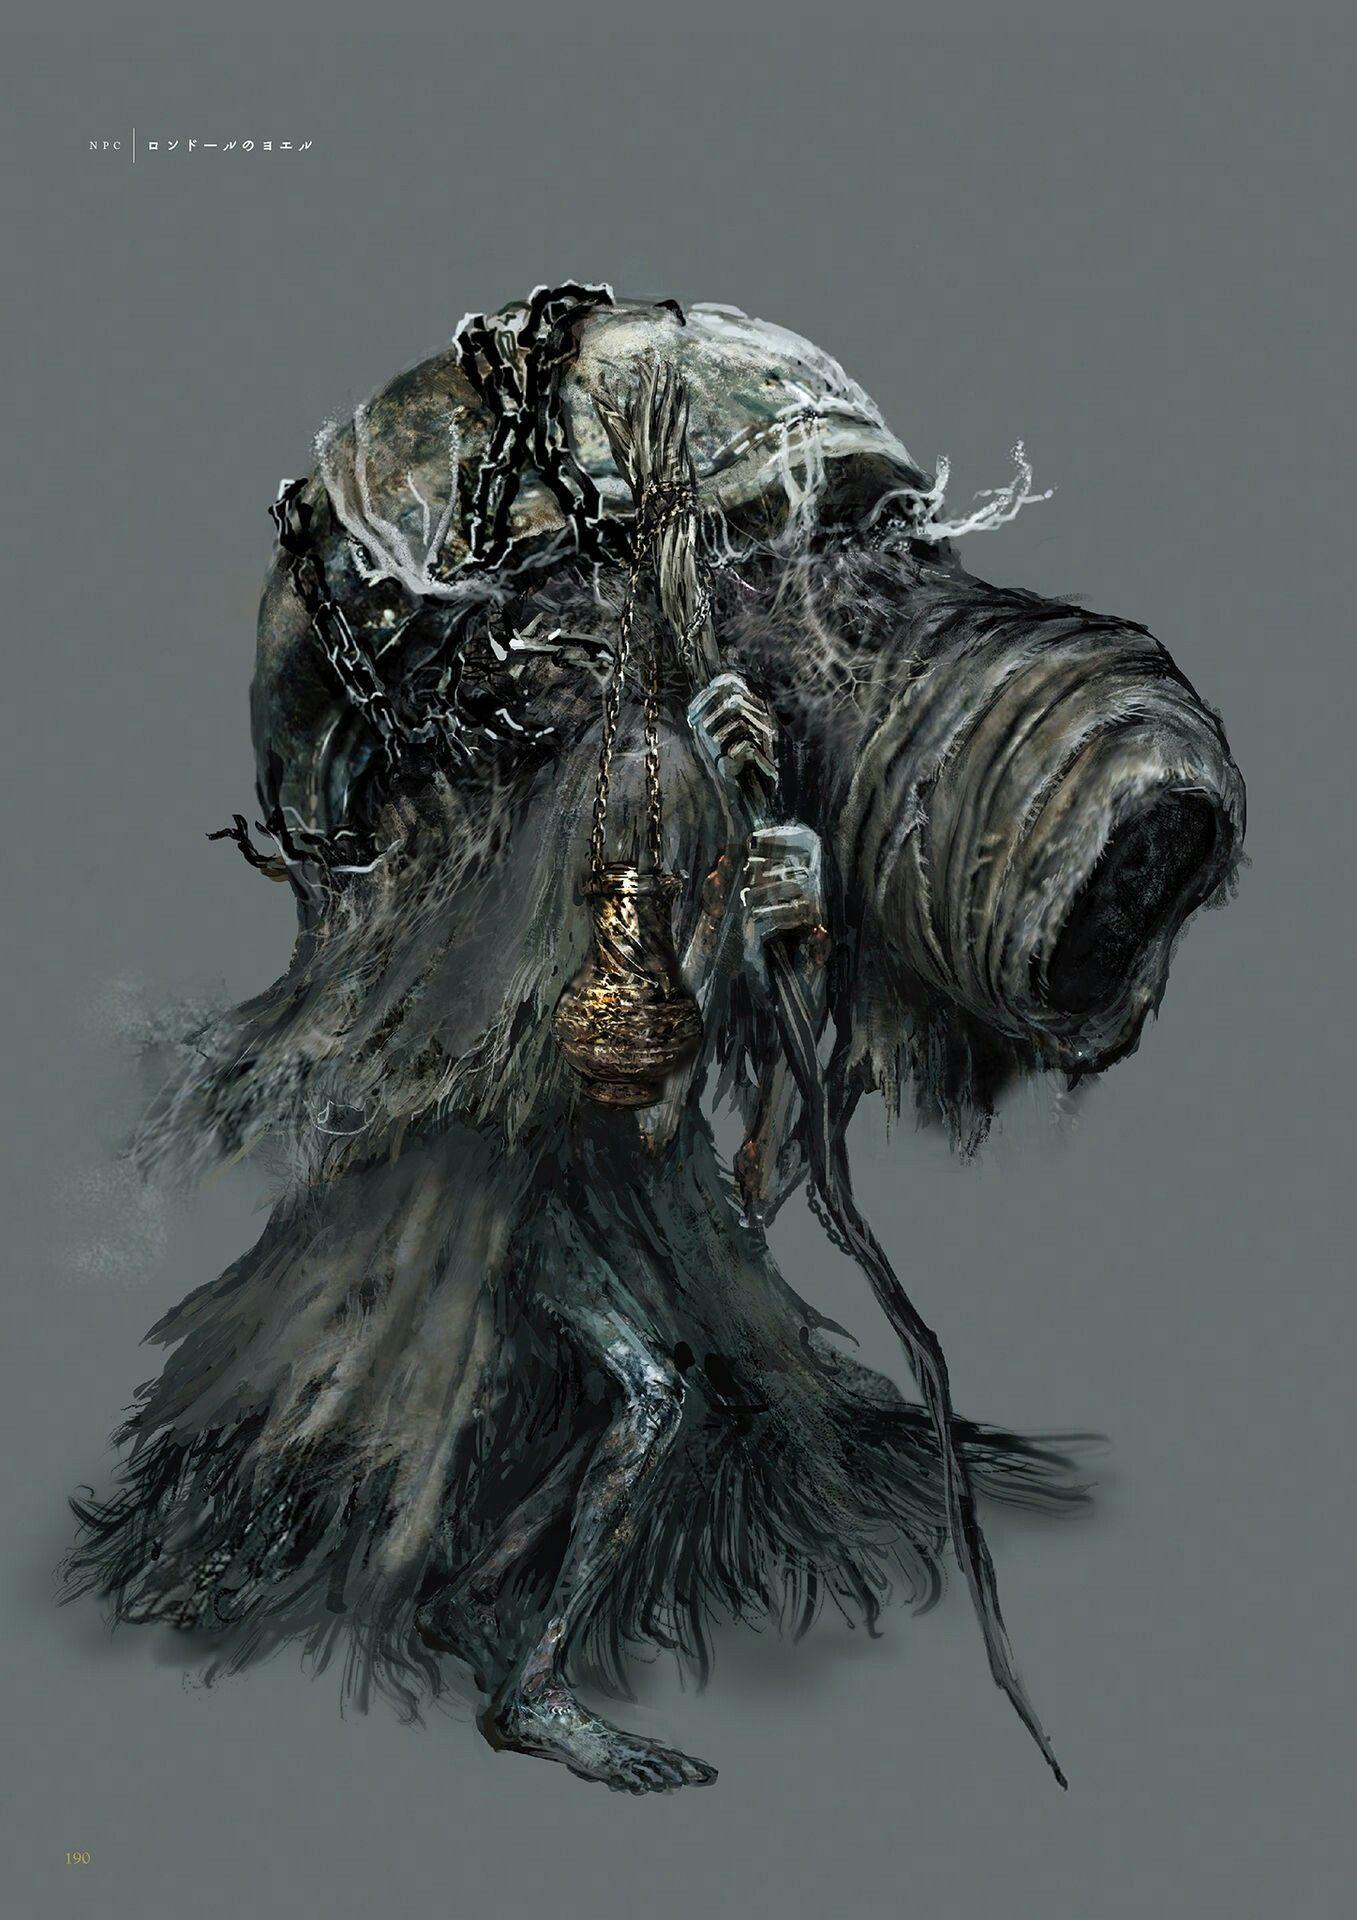 Dark Souls 3 Concept Art Yoel Concept Art Dark Souls Concept Art Dark Souls Artwork Dark Souls Dans votre inventaire apparaîtra alors une première marque sombre. concept art dark souls artwork